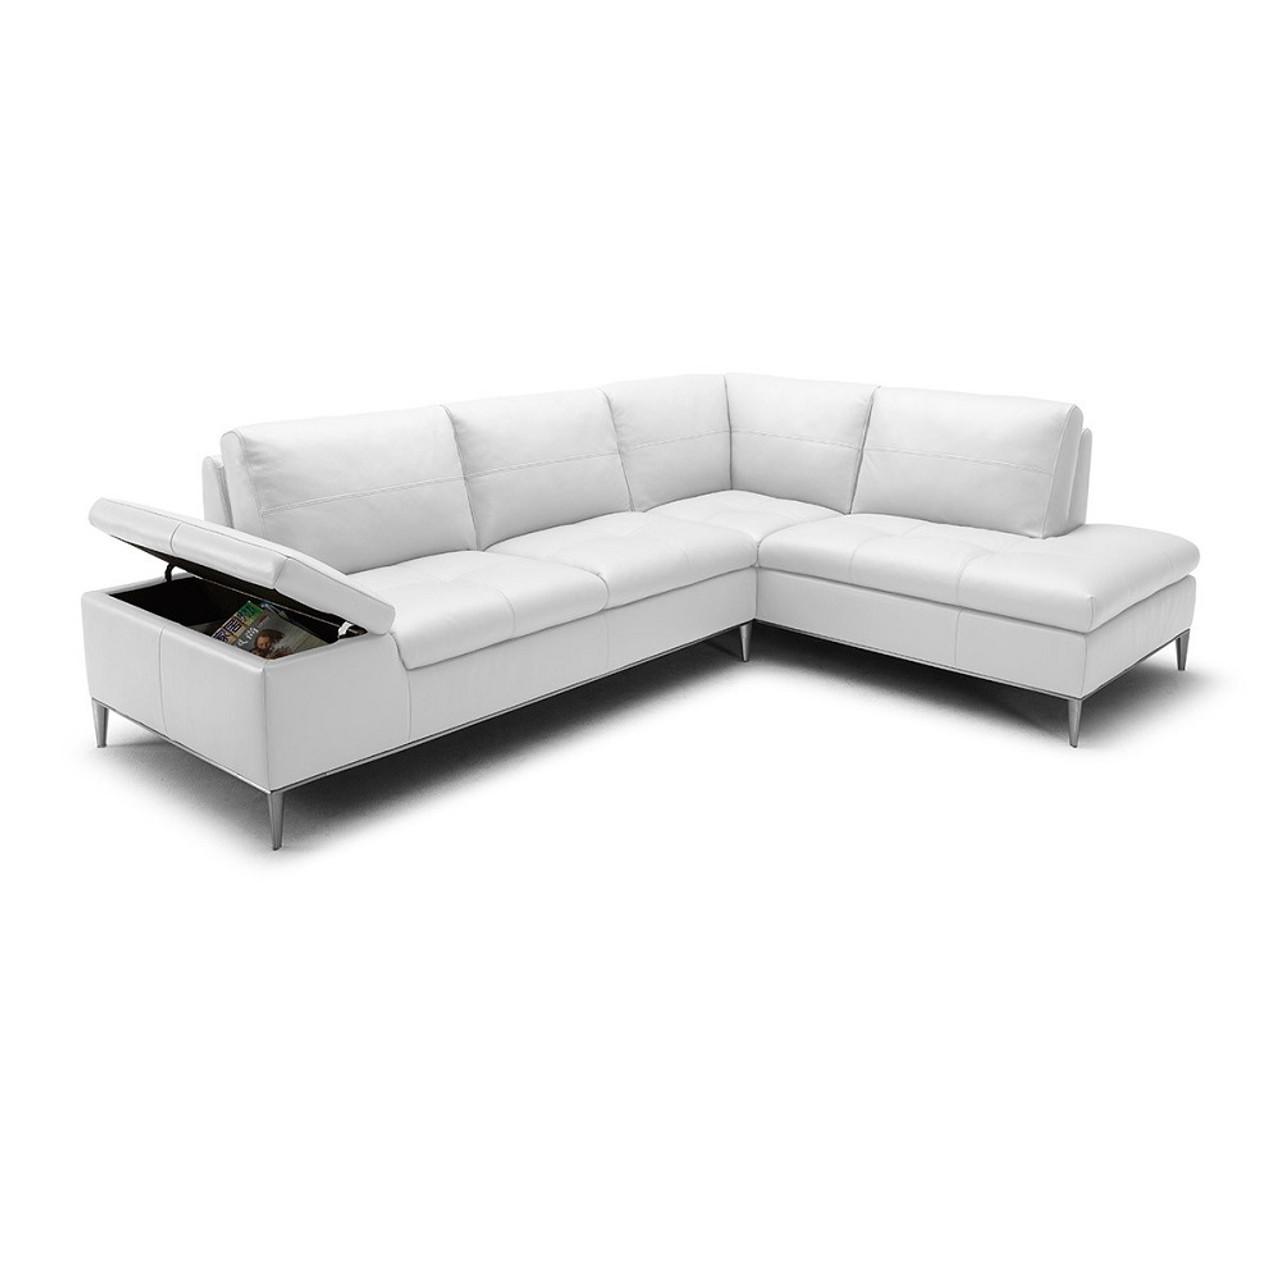 Divani Casa Gardenia - Modern White Sectional Sofa with Chaise ...